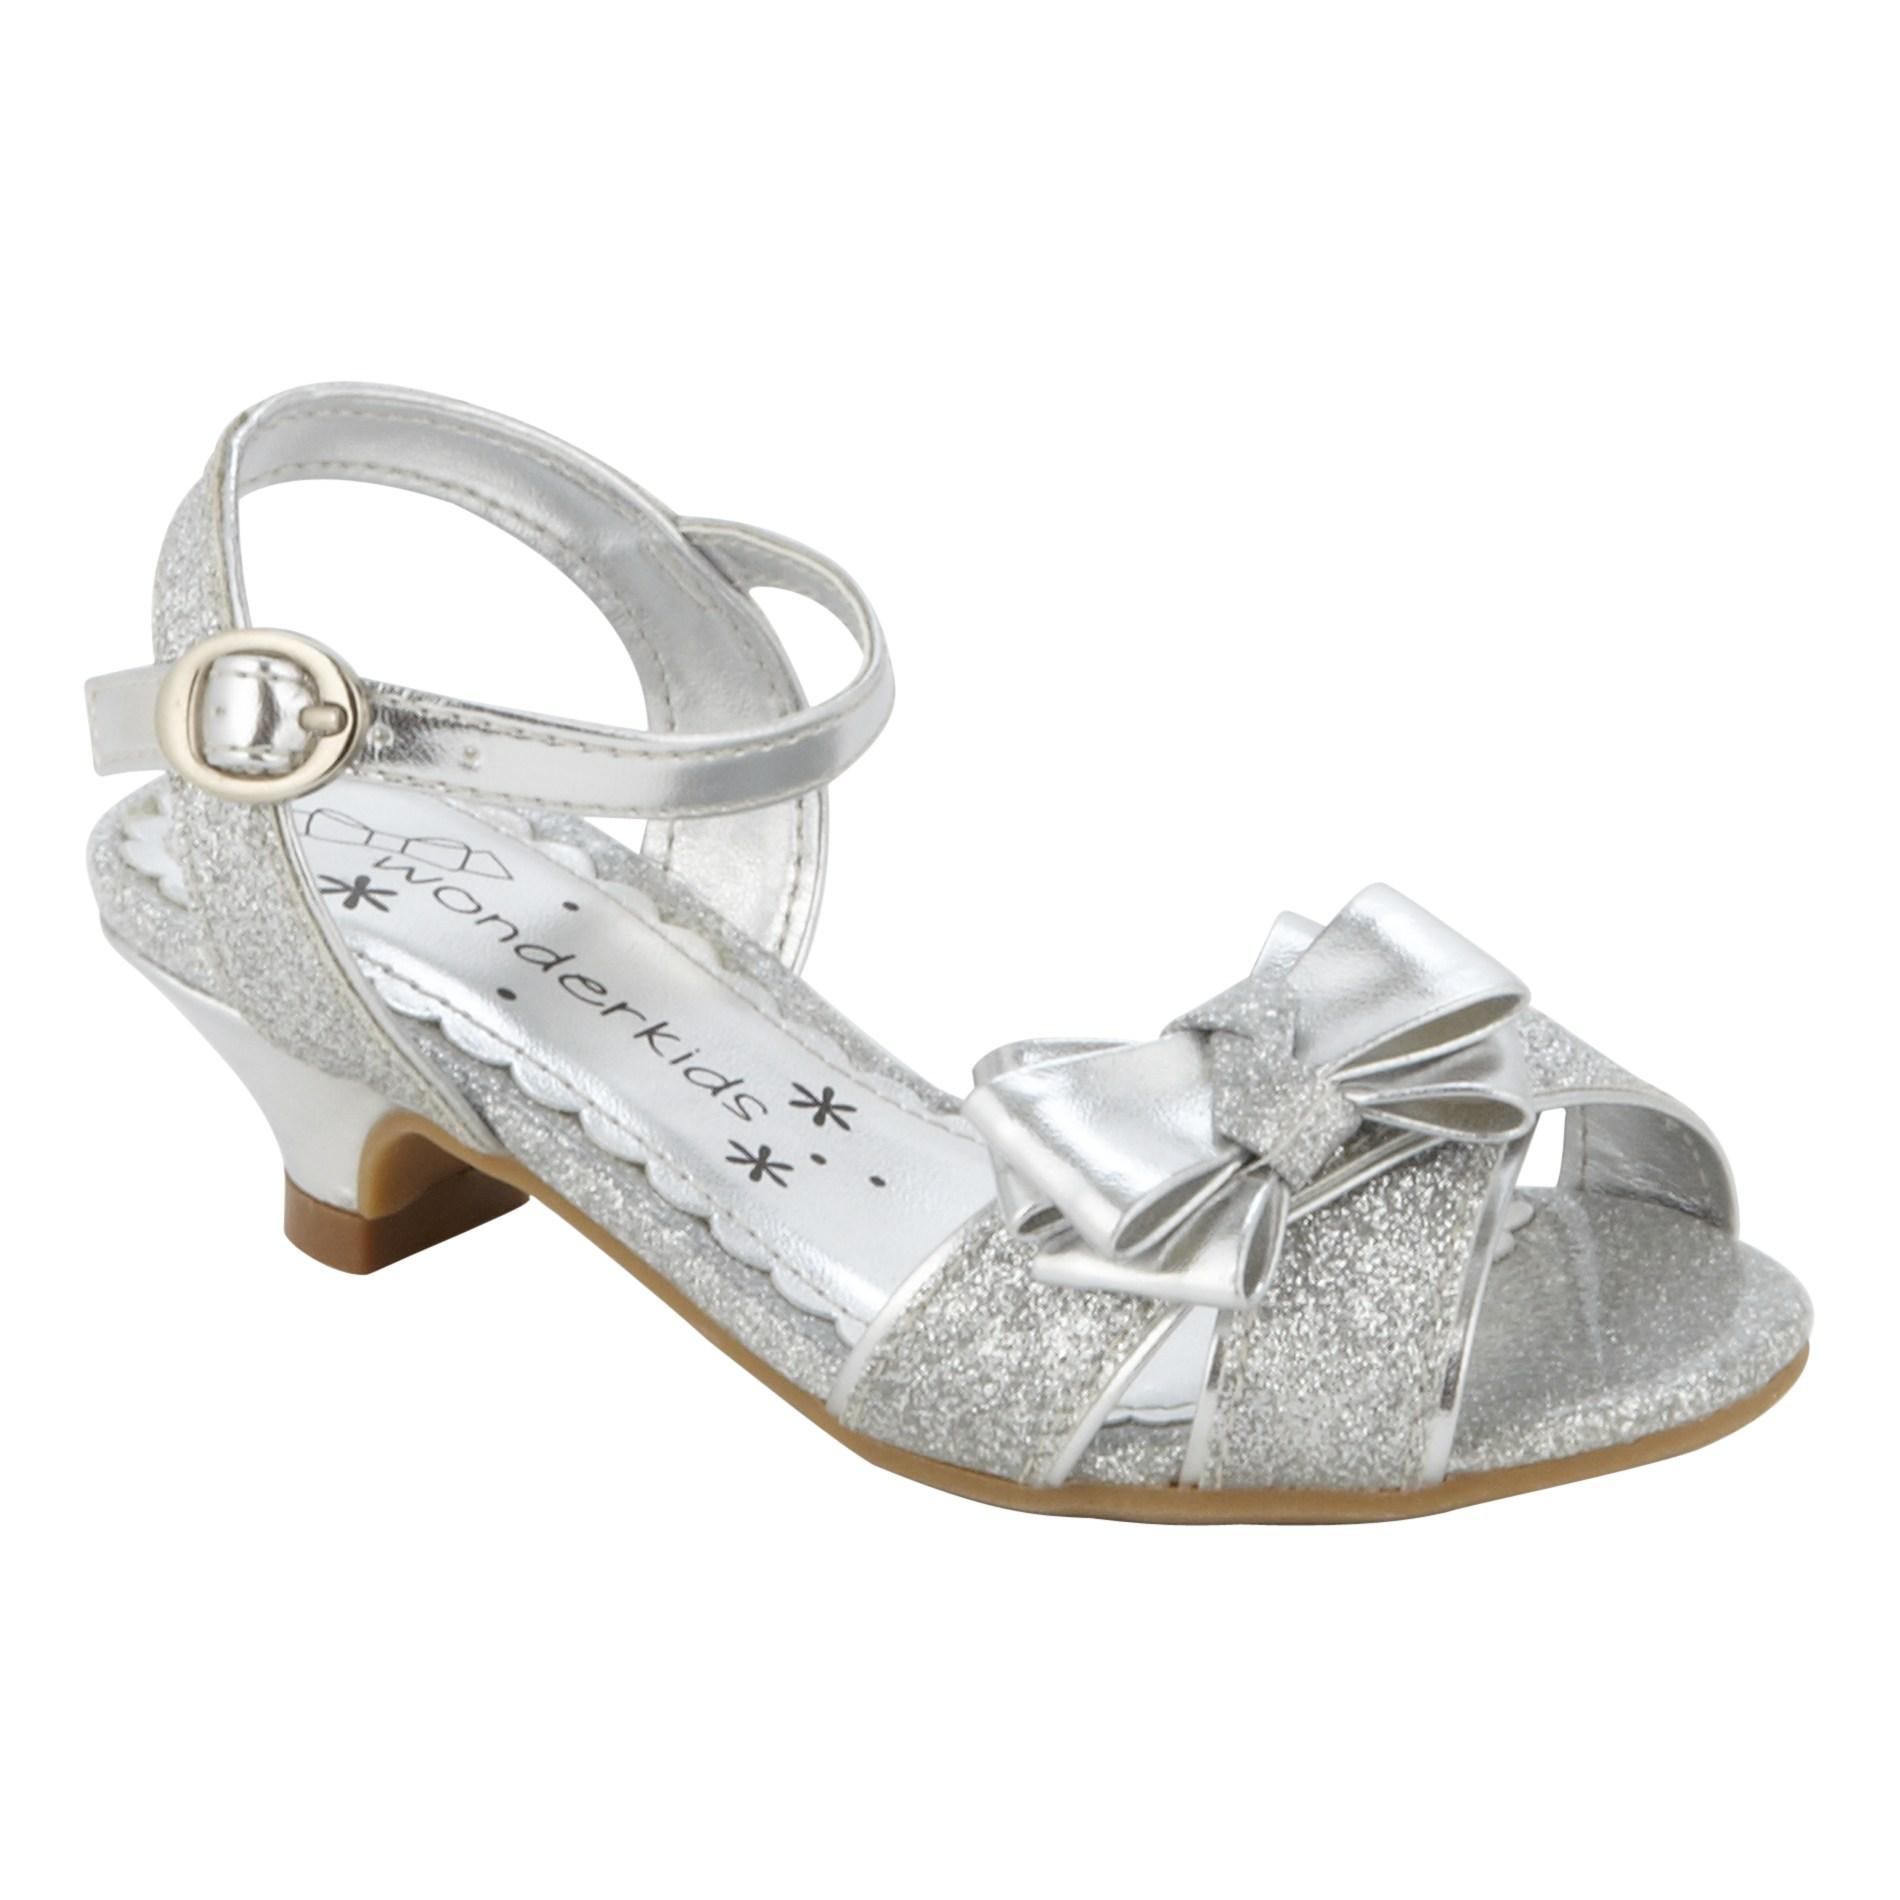 Wonderkids Toddler Girl' Dress Shoe Quintinala - Silver